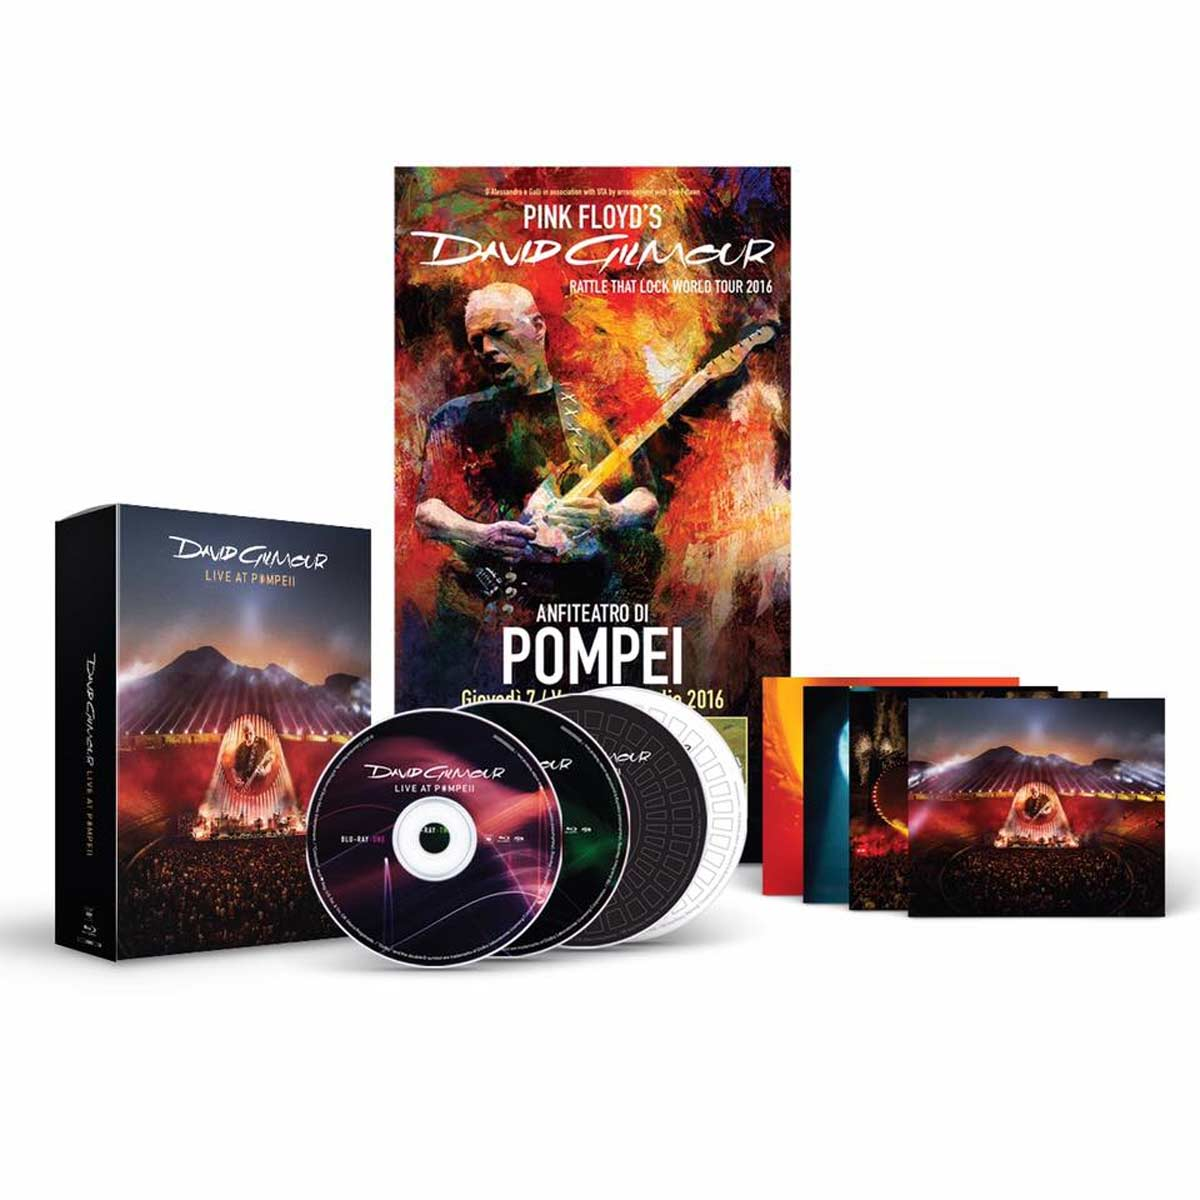 david gilmour live at pompeii box set semm music store more. Black Bedroom Furniture Sets. Home Design Ideas